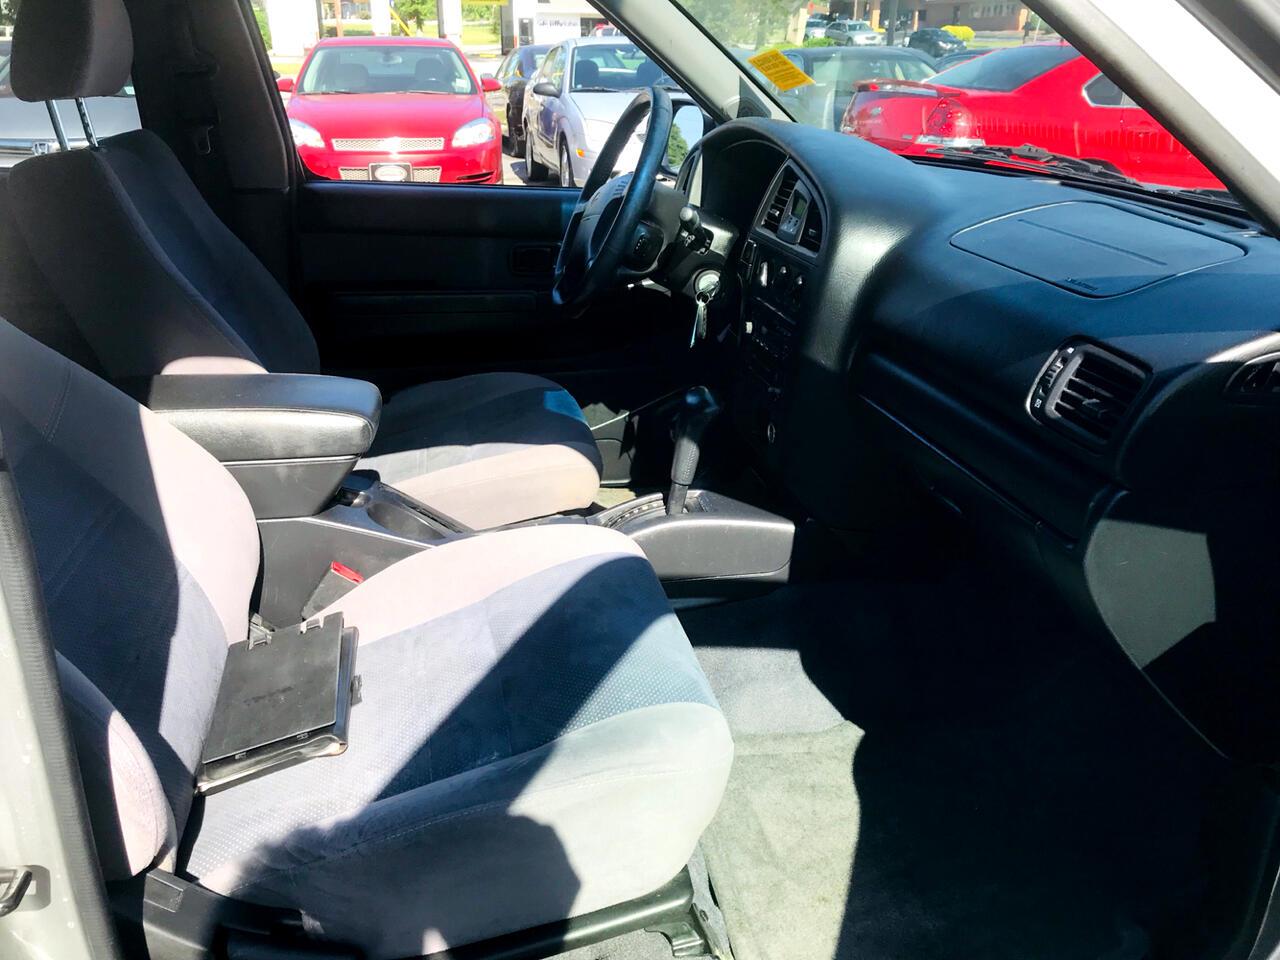 2001 Nissan Pathfinder SE 4WD